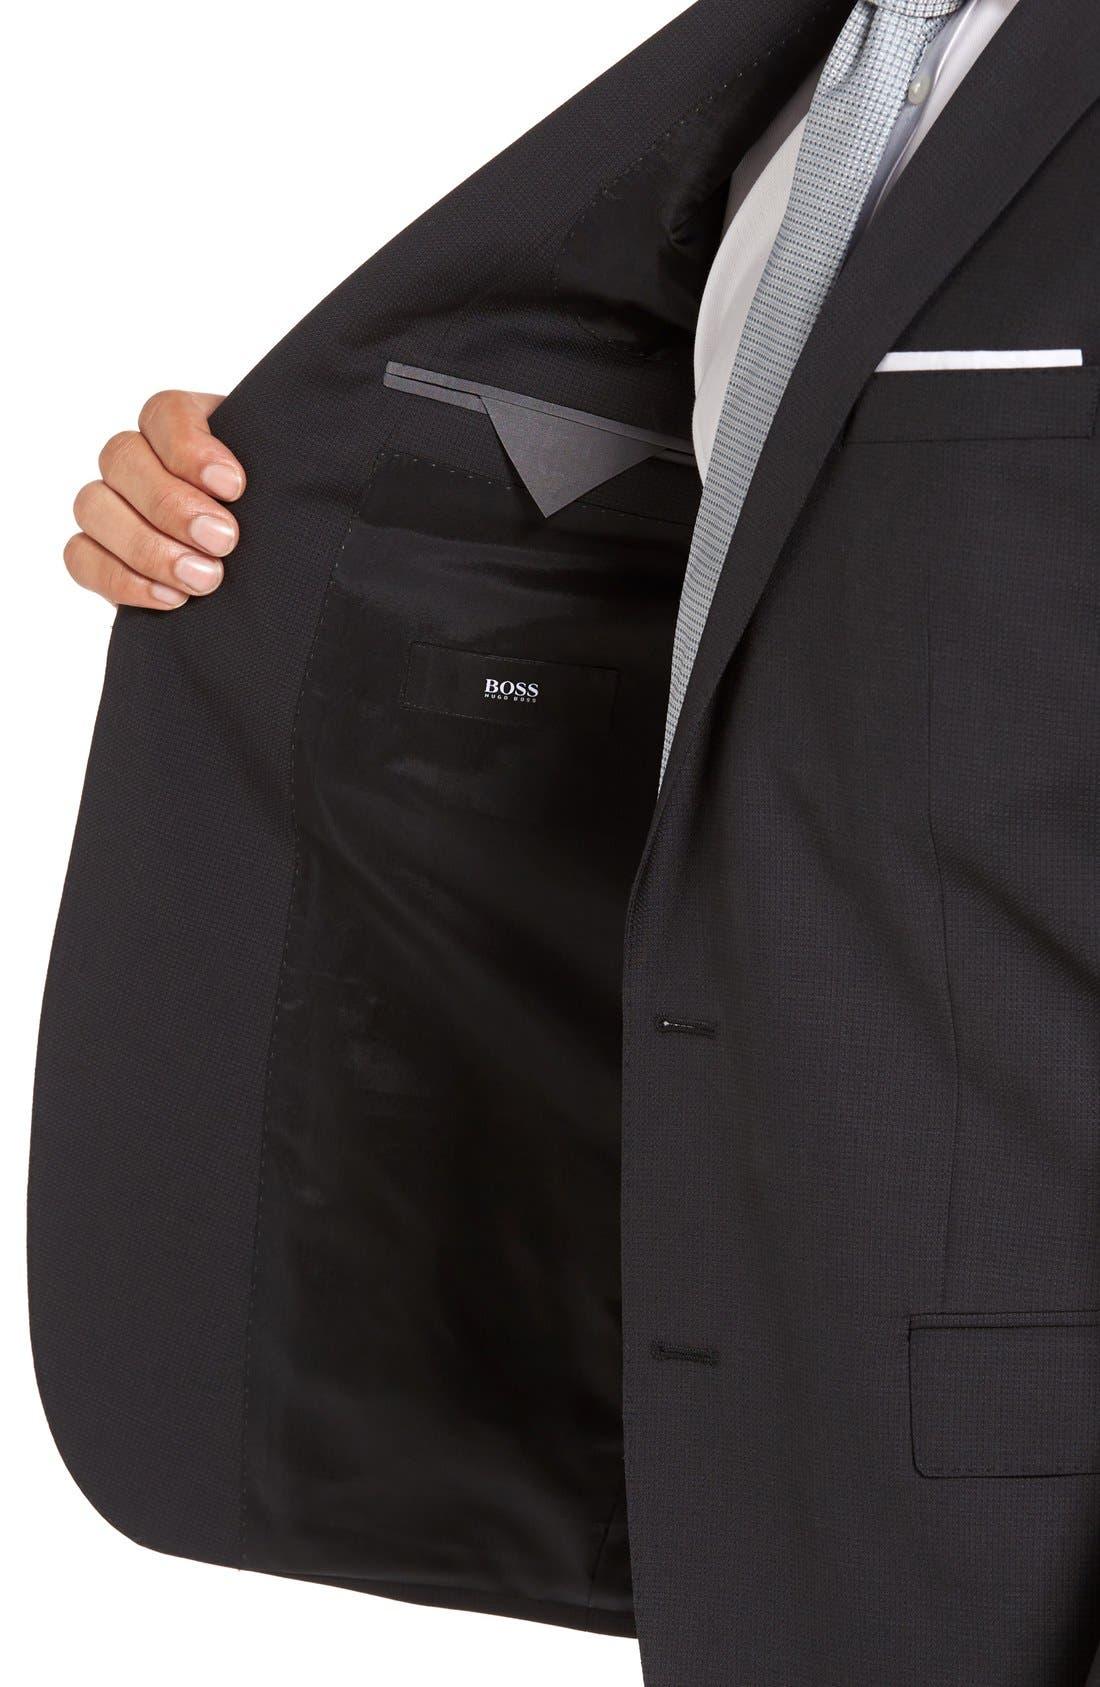 'Huge/Genius' Trim Fit Solid Wool Suit,                             Alternate thumbnail 6, color,                             BLACK